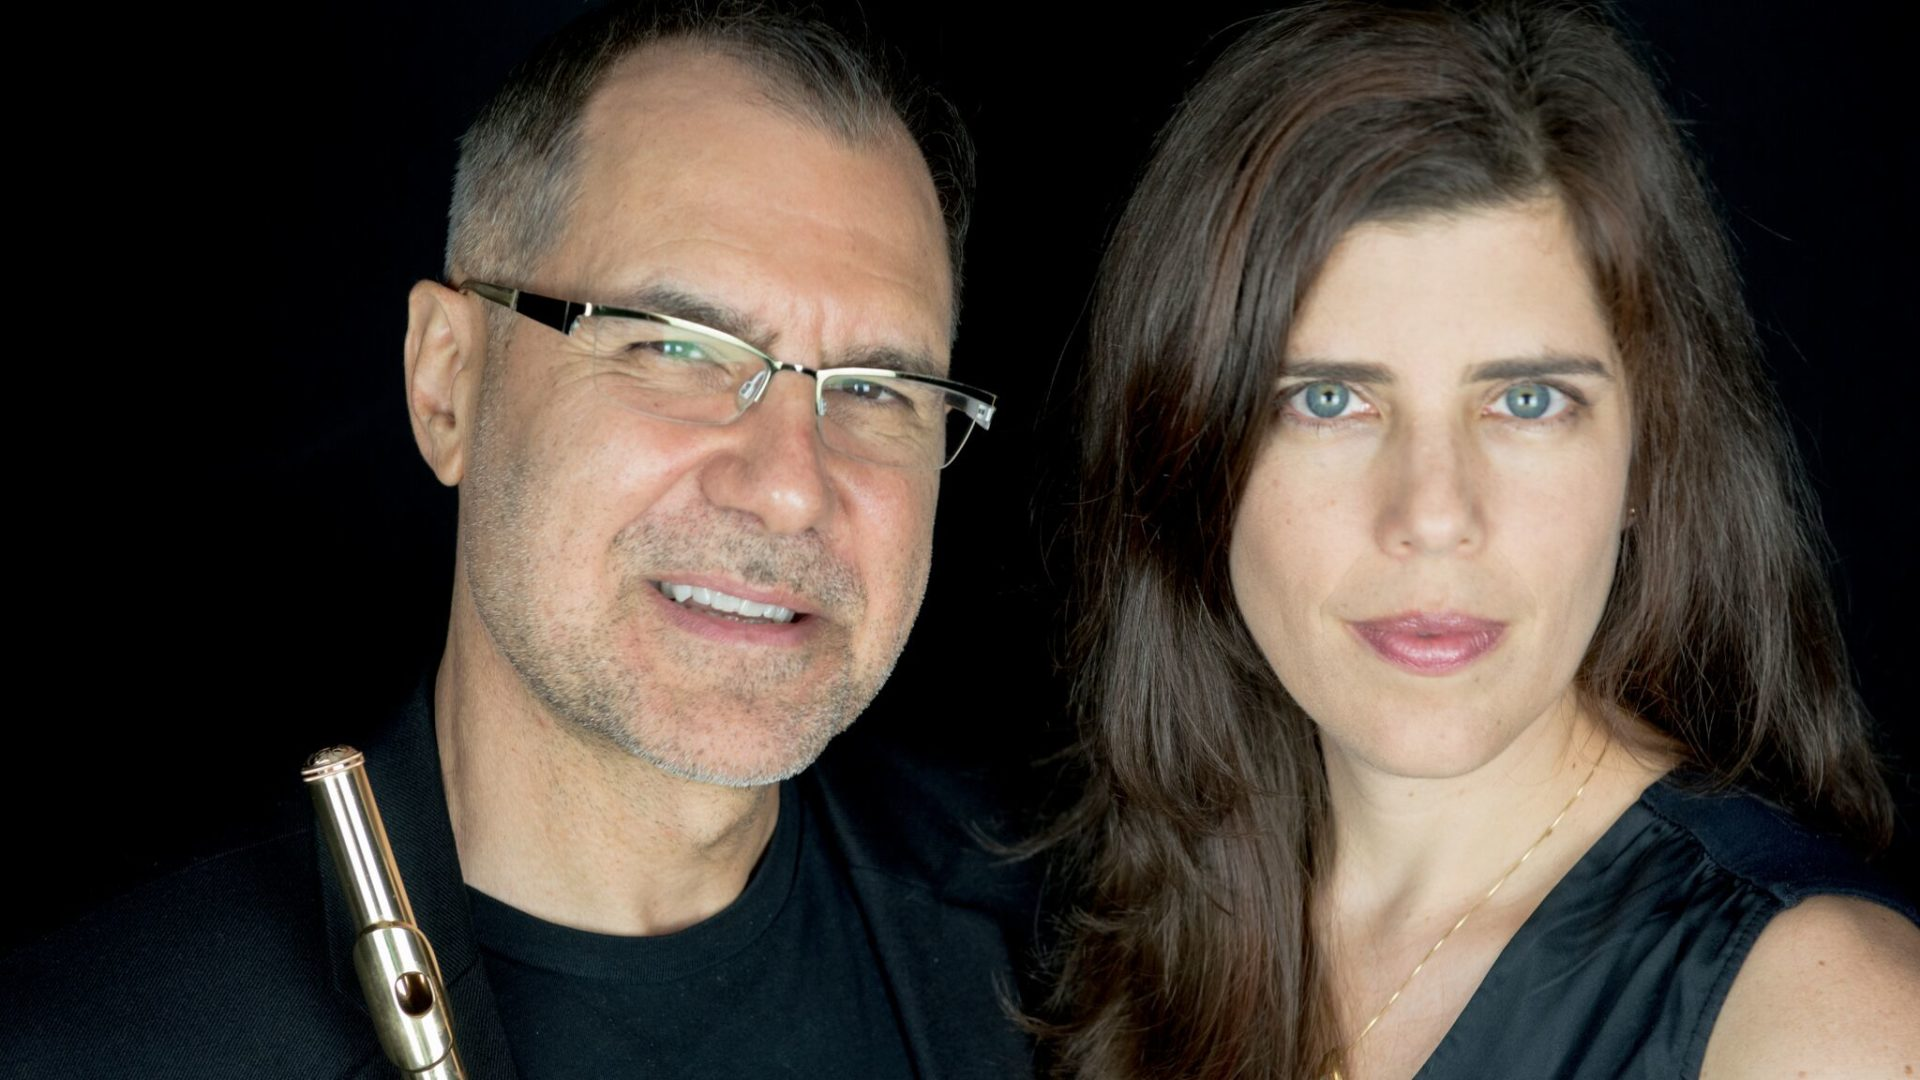 Anima Vox Duo